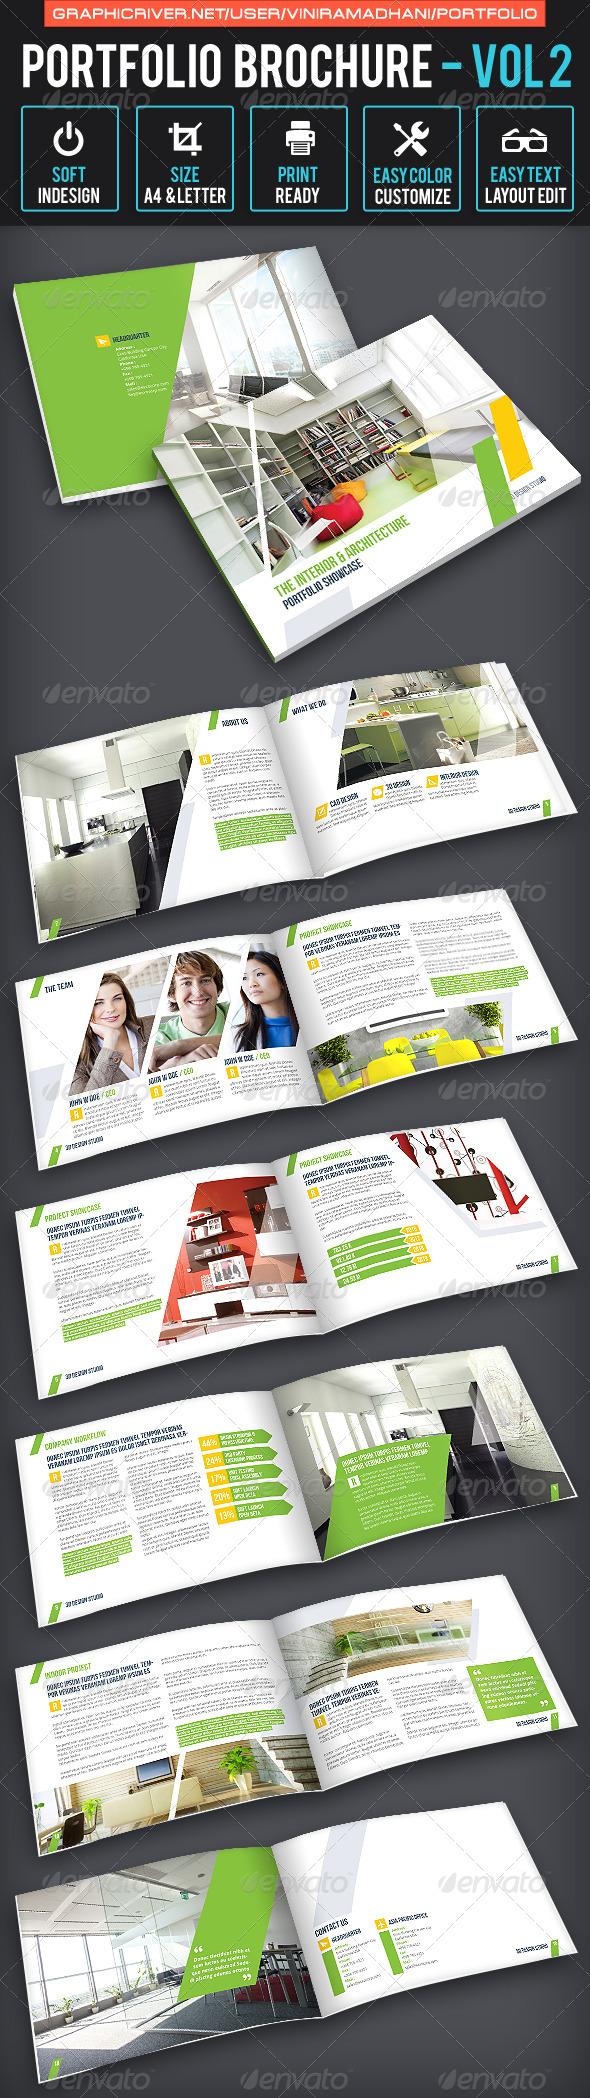 Portfolio Brochure Volume 2 - Corporate Brochures